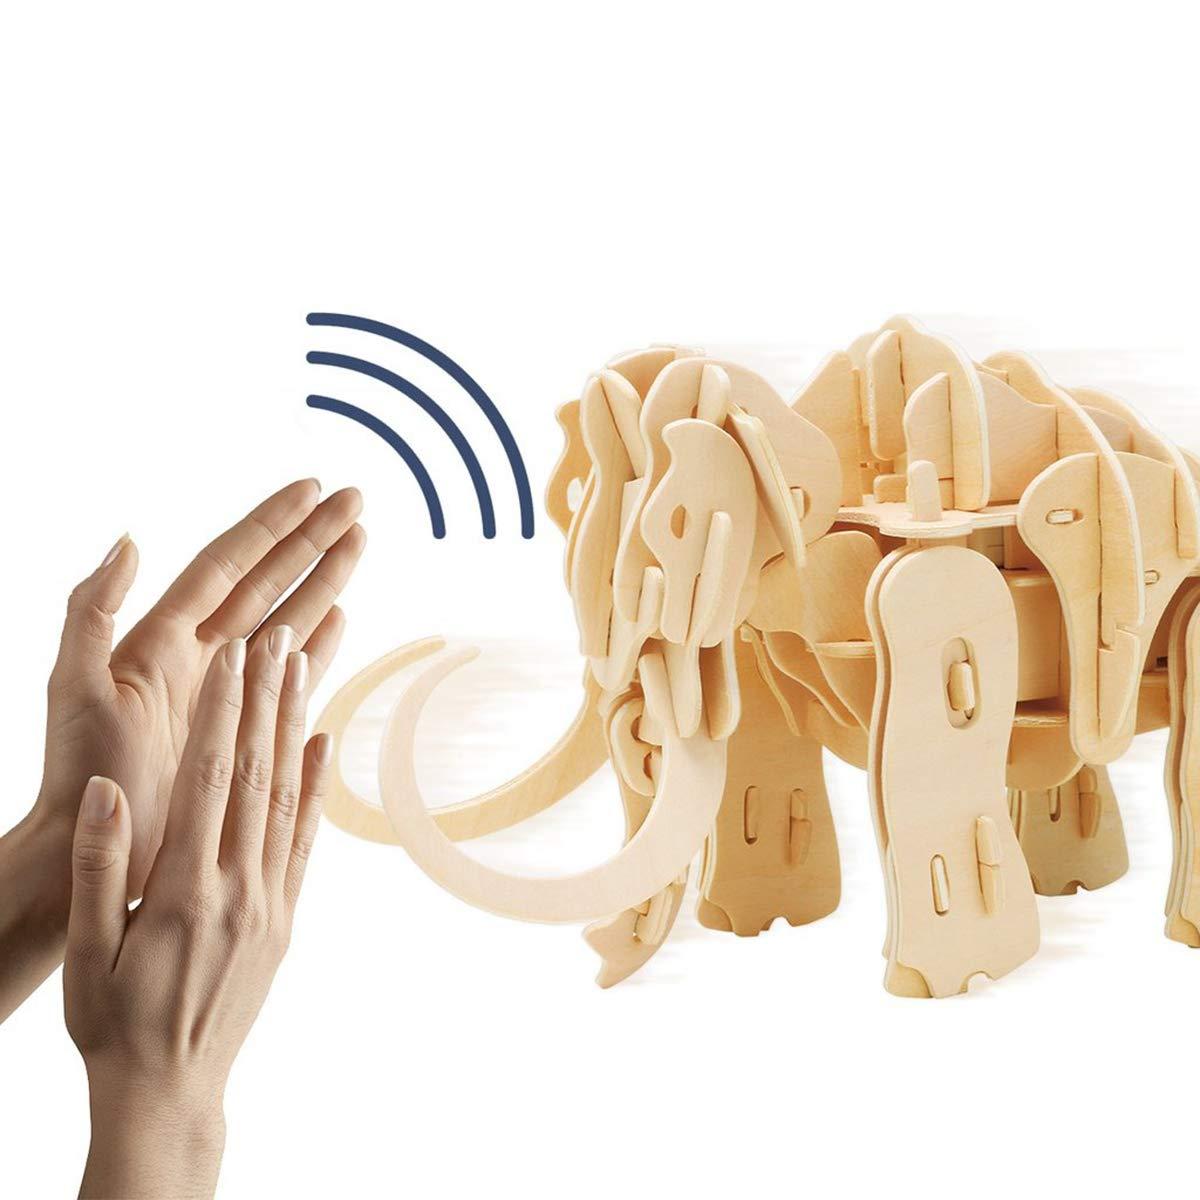 HXZB 3D Wooden Puzzle, Teen Puzzle Educational Toy Sound Control Robot Mammoth B07L2QS922 3D-Puzzles Glücklicher Startpunkt   | Verbraucher zuerst